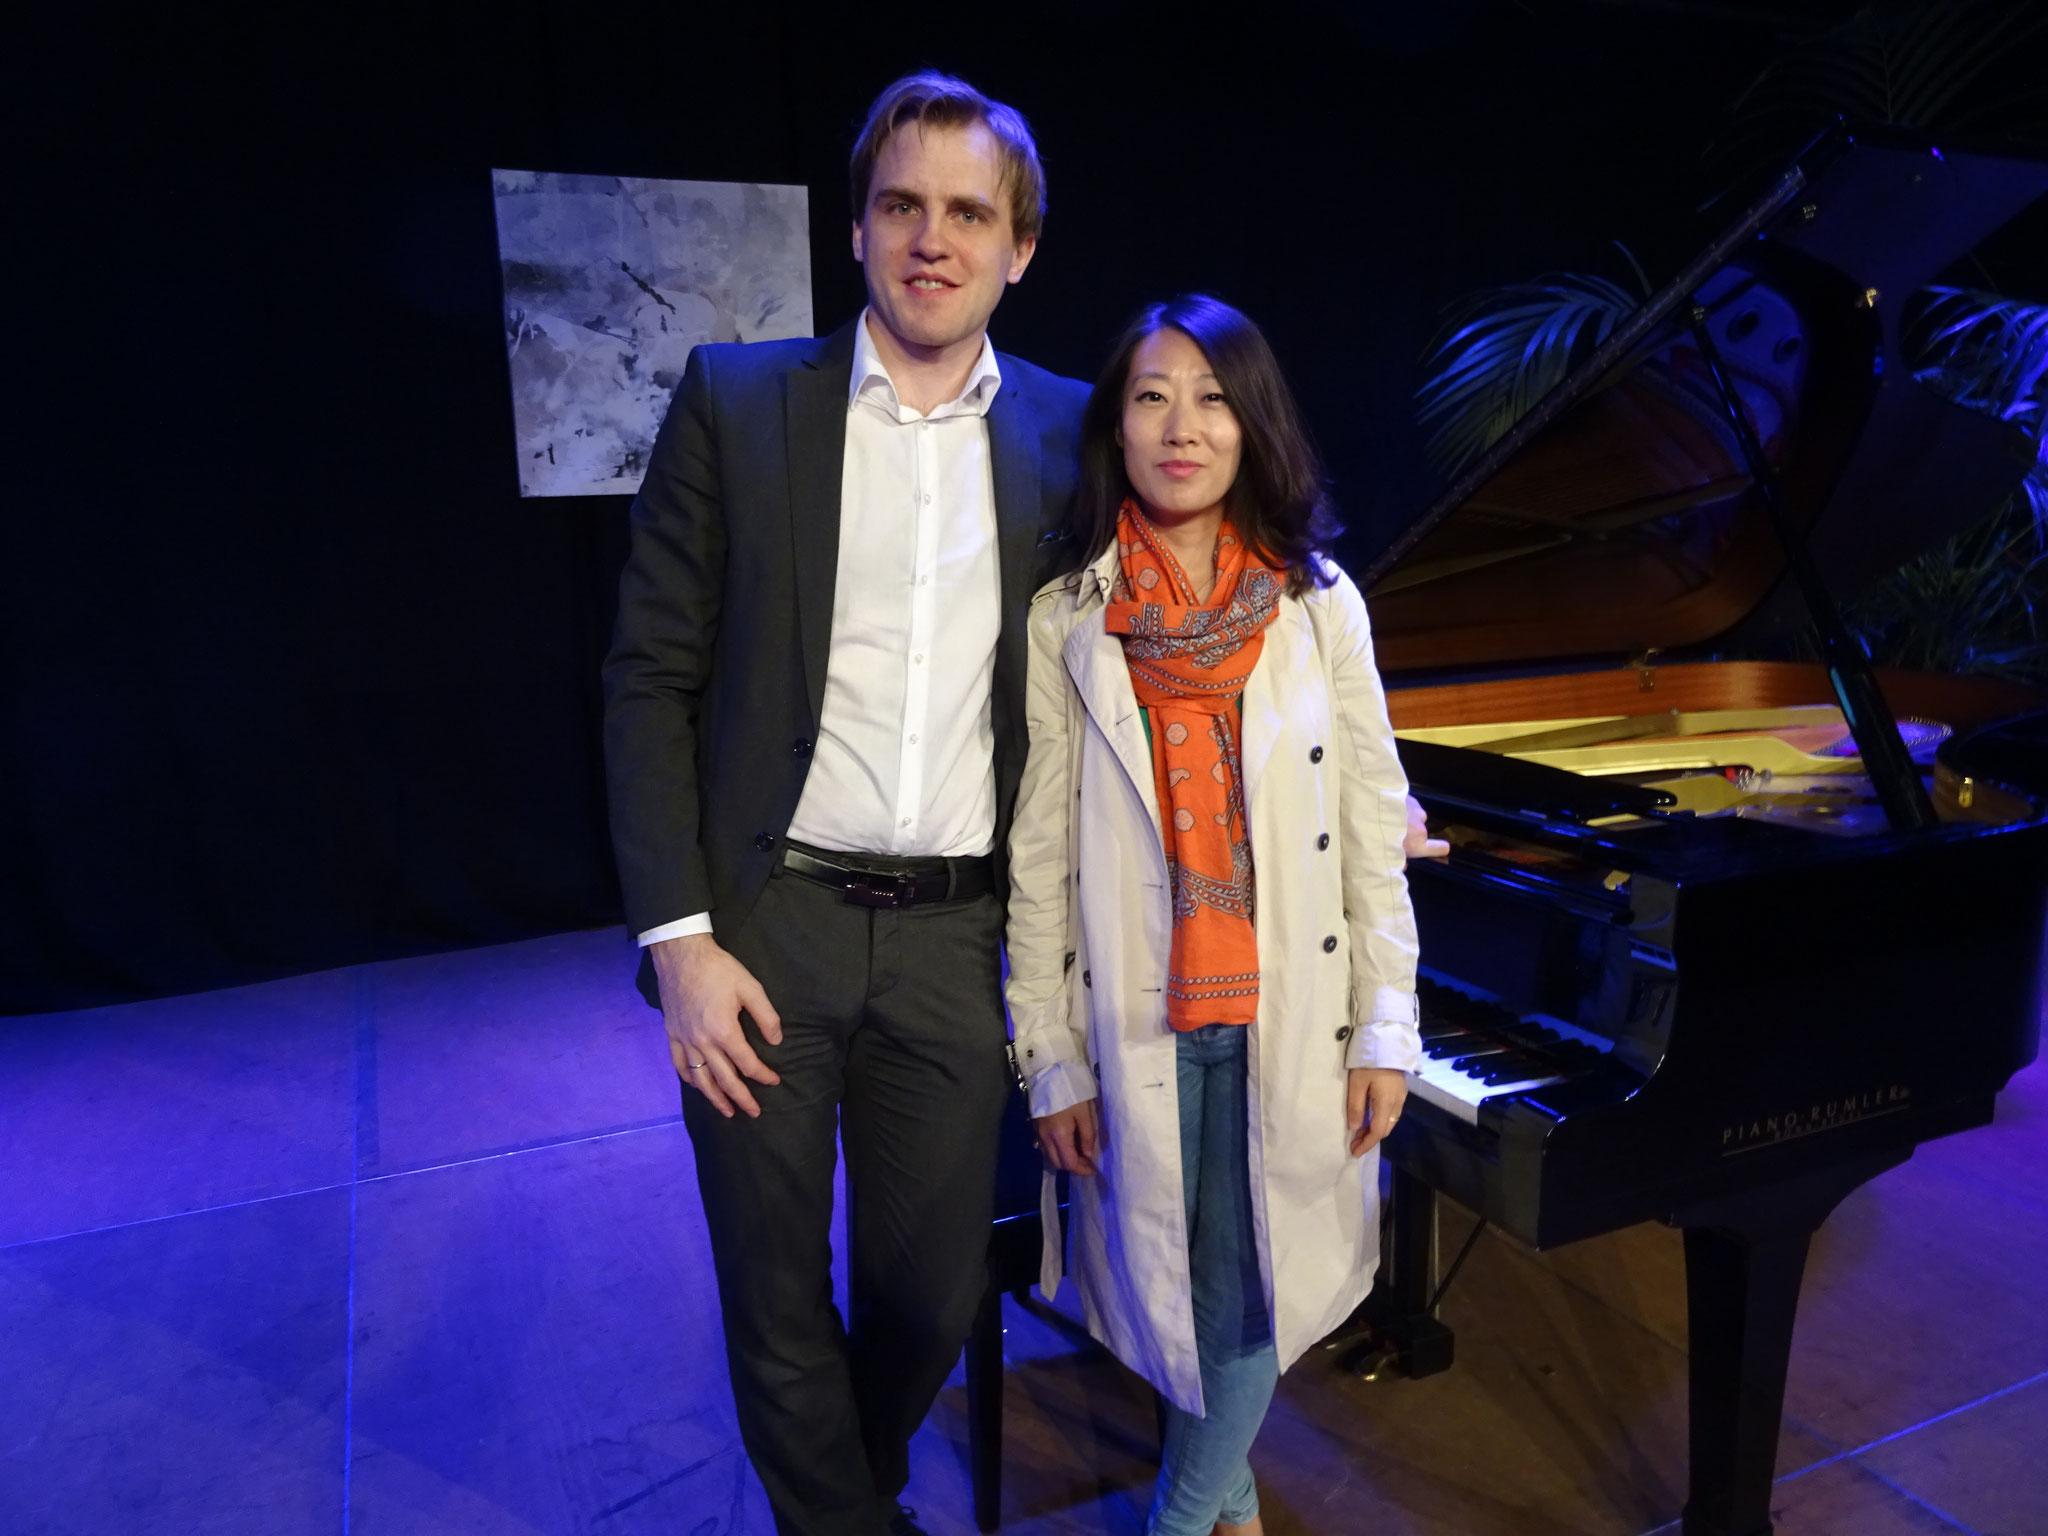 Florian Koltun kam zusammen mit Ehefrau Xin Wang nach Windeck.